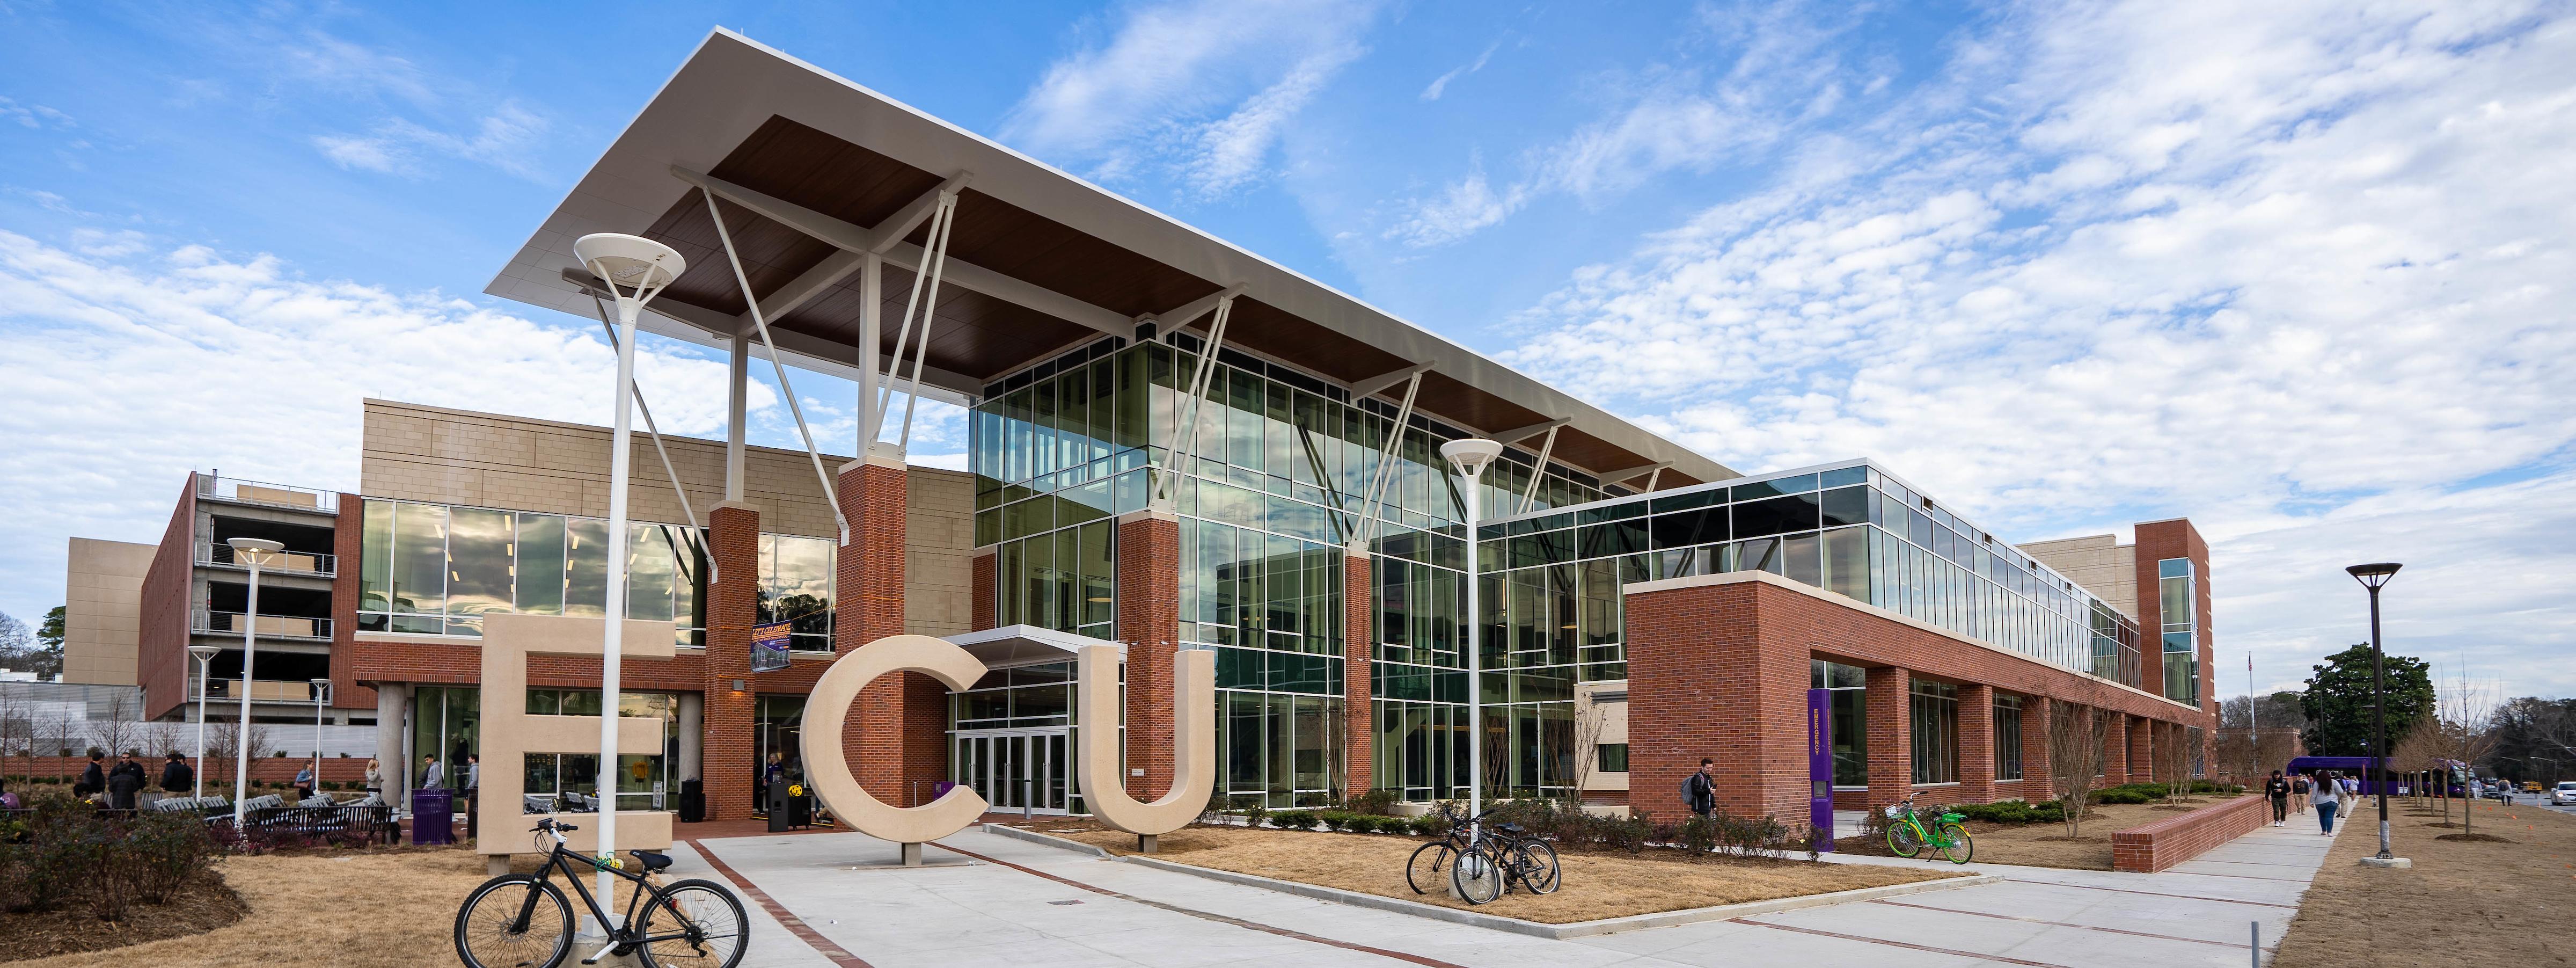 ECU Student Union